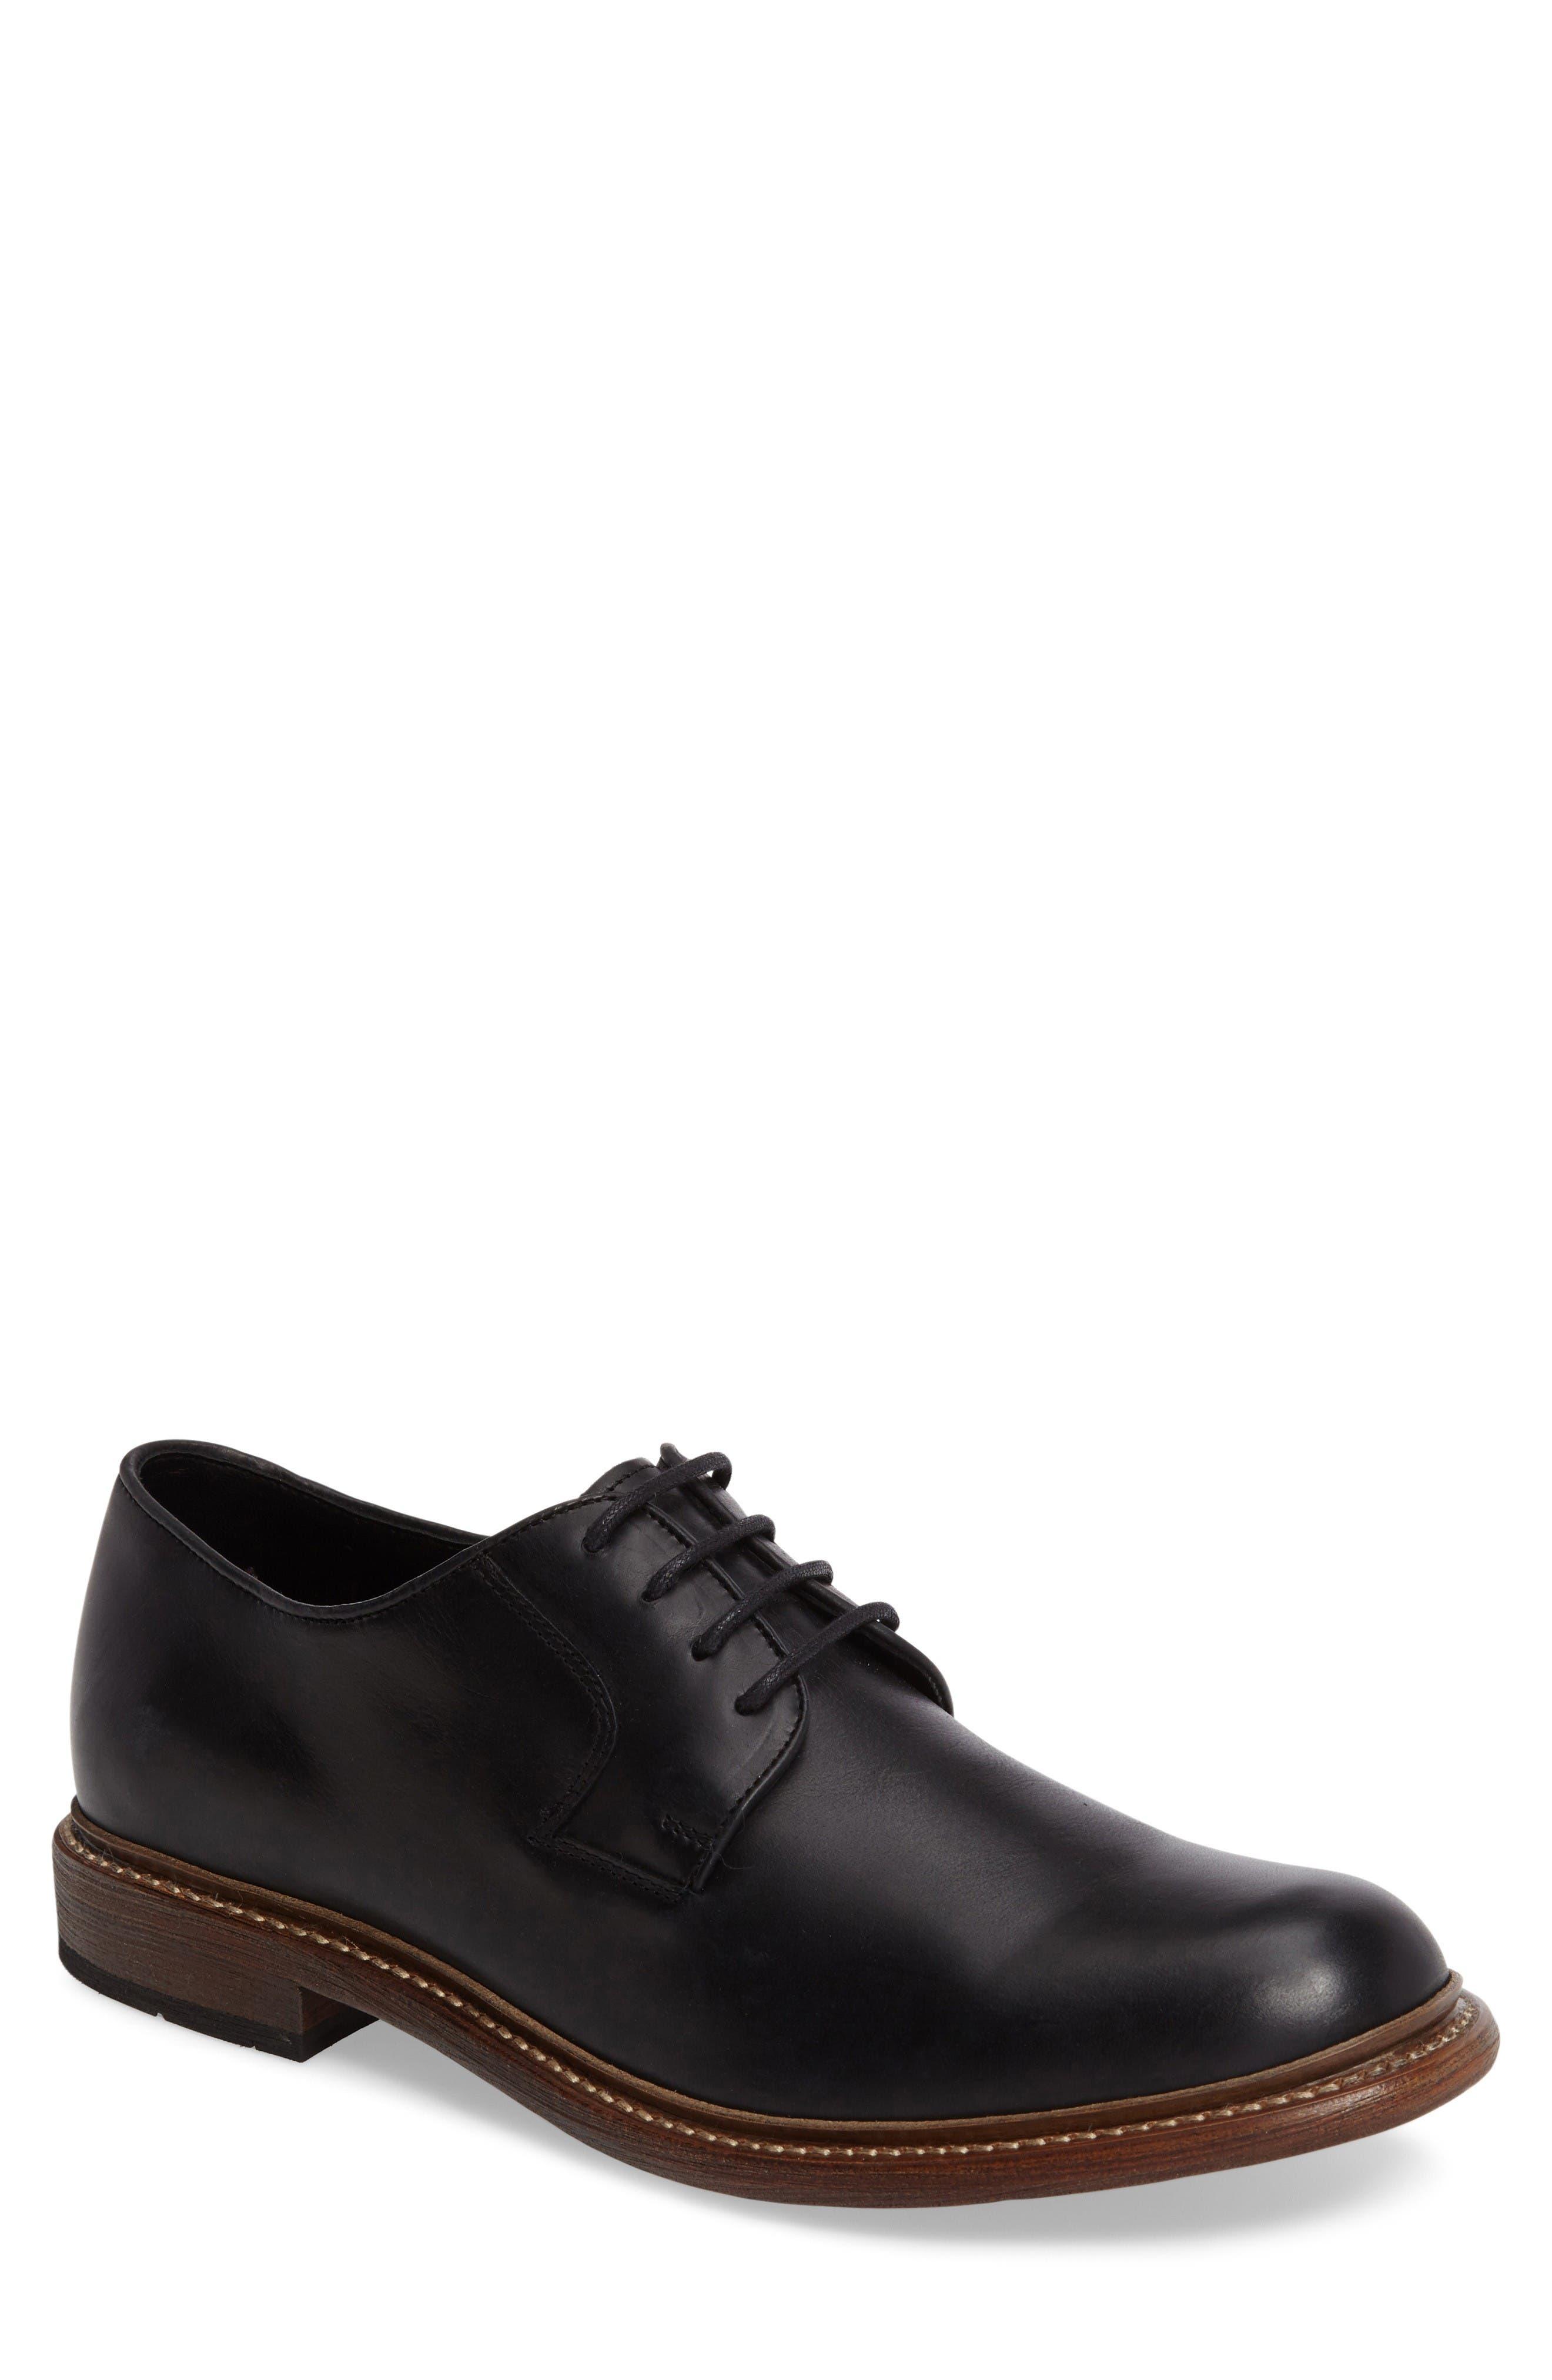 1000 Mile Luke Plain Toe Derby,                             Main thumbnail 1, color,                             Black Leather